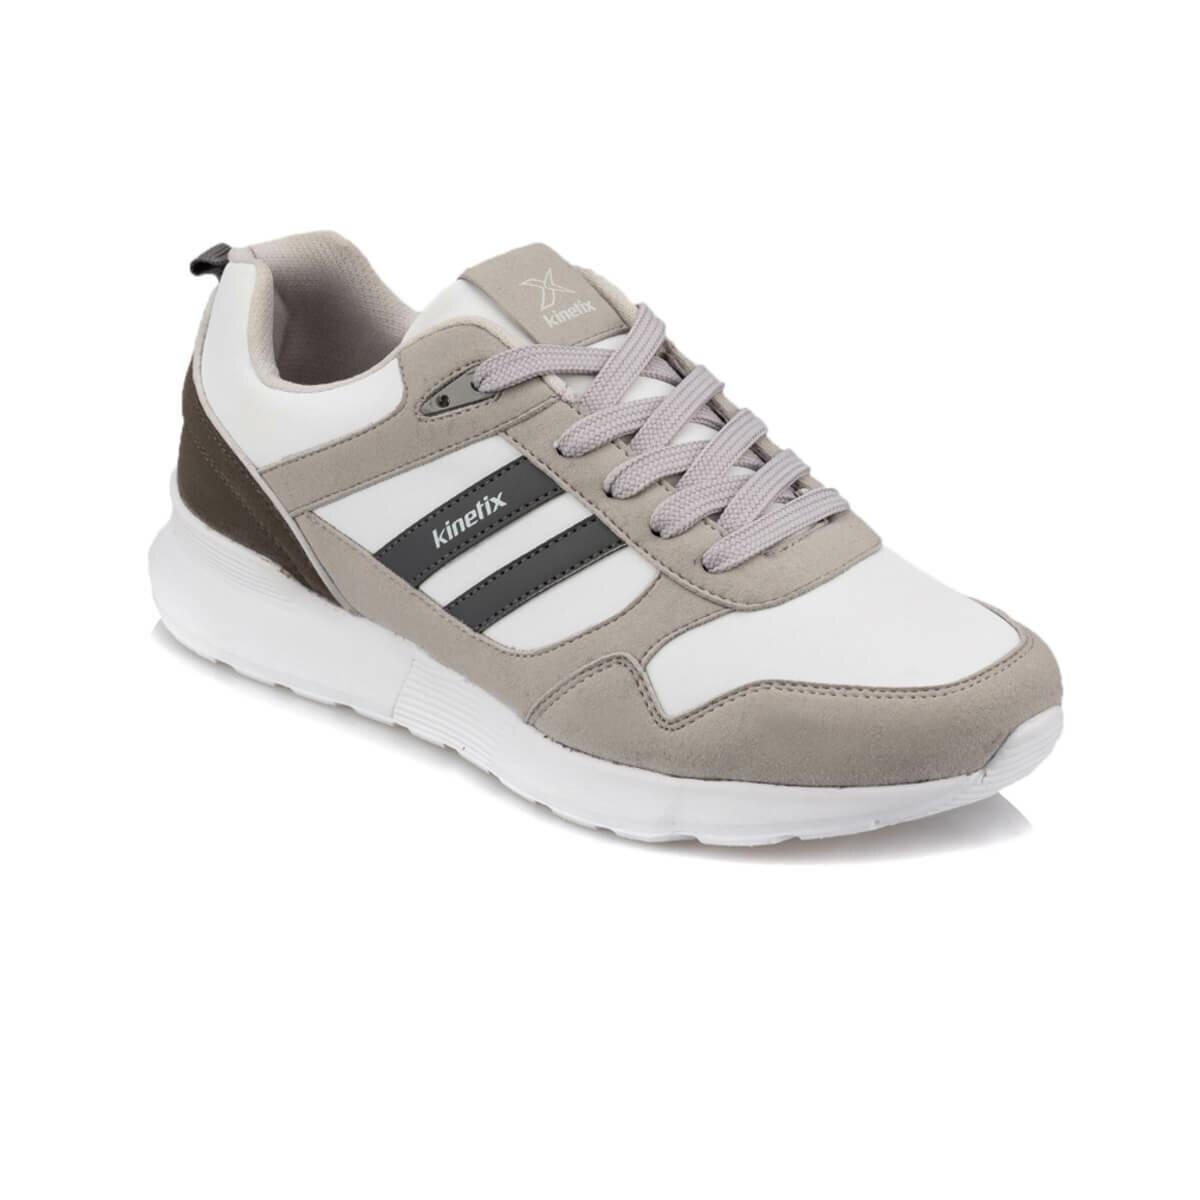 FLO ESPEN PU M 9PR White Men 'S Sneaker Shoes KINETIX